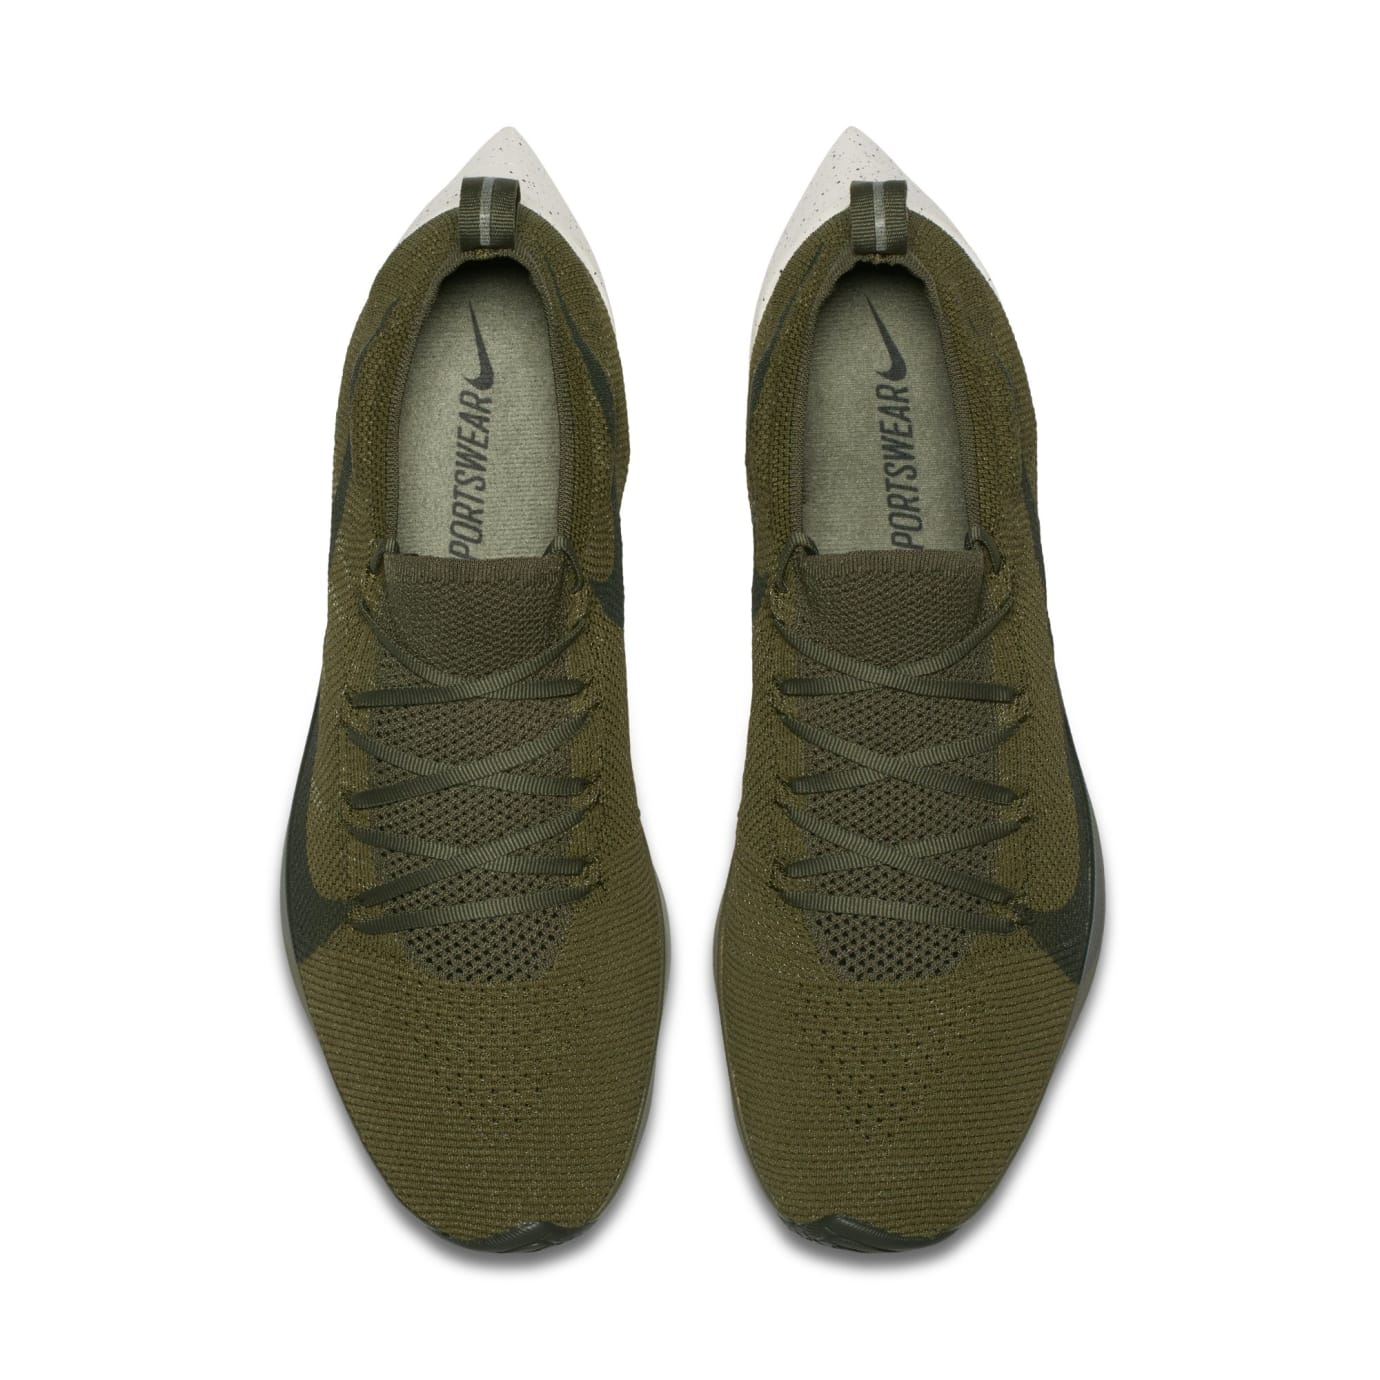 c27037869e Nike Vapor Street Flyknit 'Khaki' AQ1763-200 'Olive' AQ1763-201 ...